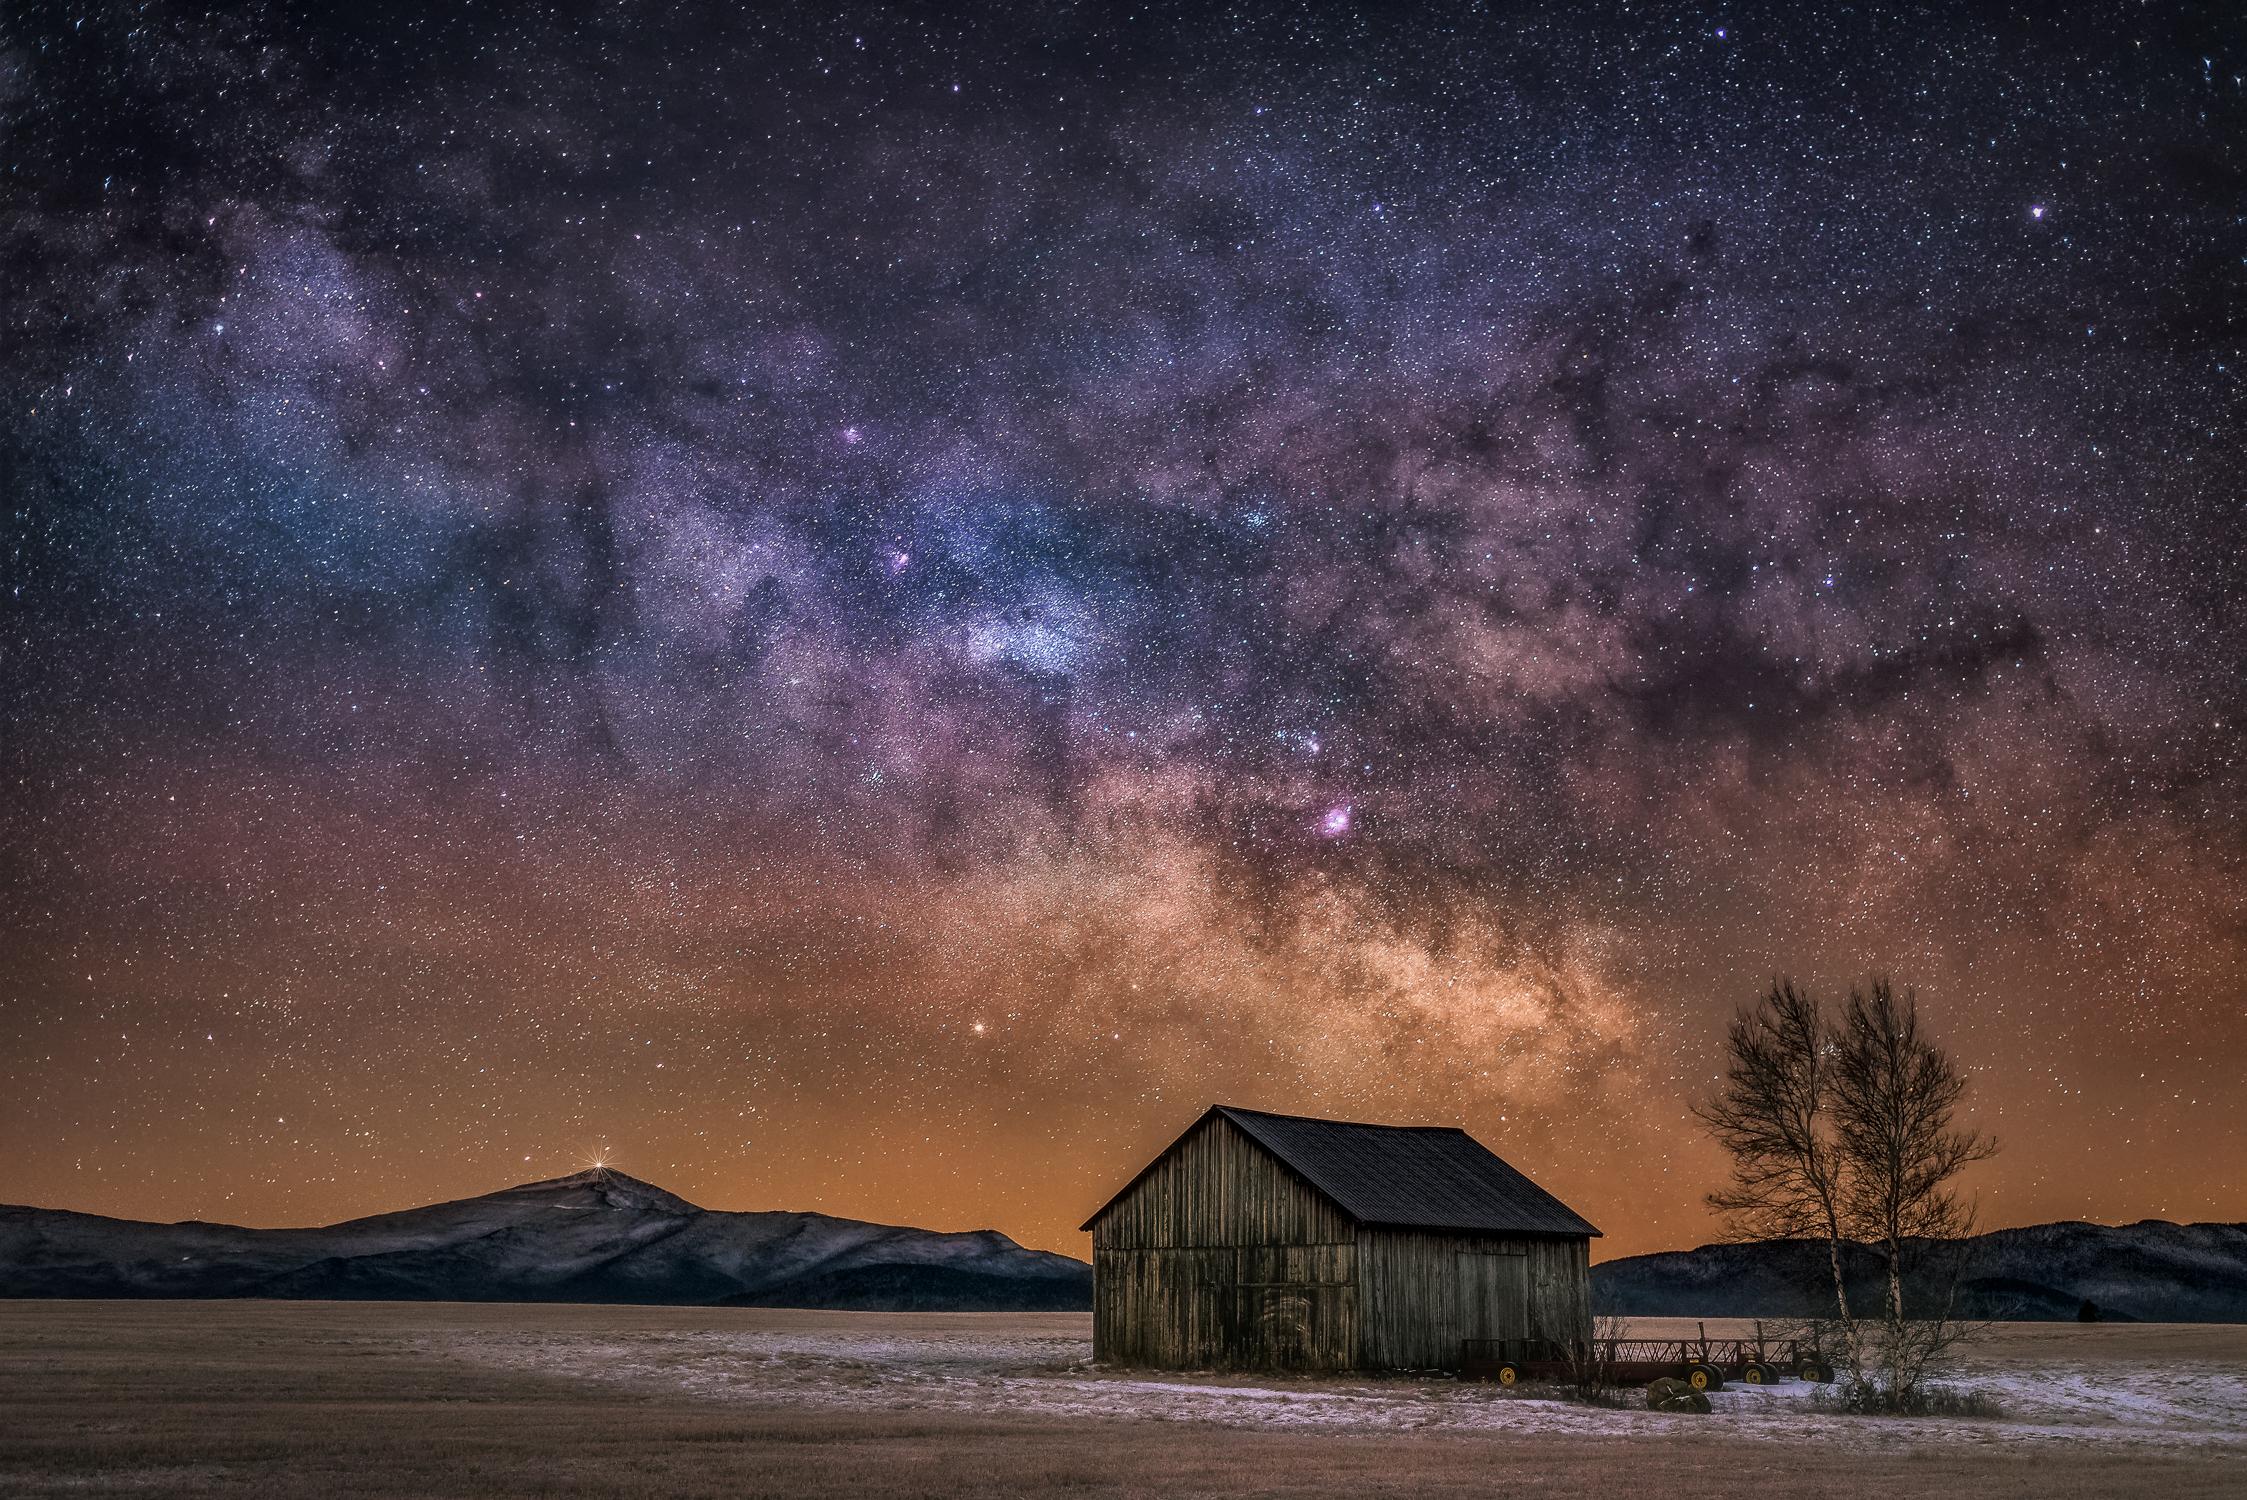 """A Starry Night at the Norman Ridge"" - The Norman Ridge, Adirondack State Park, New York"